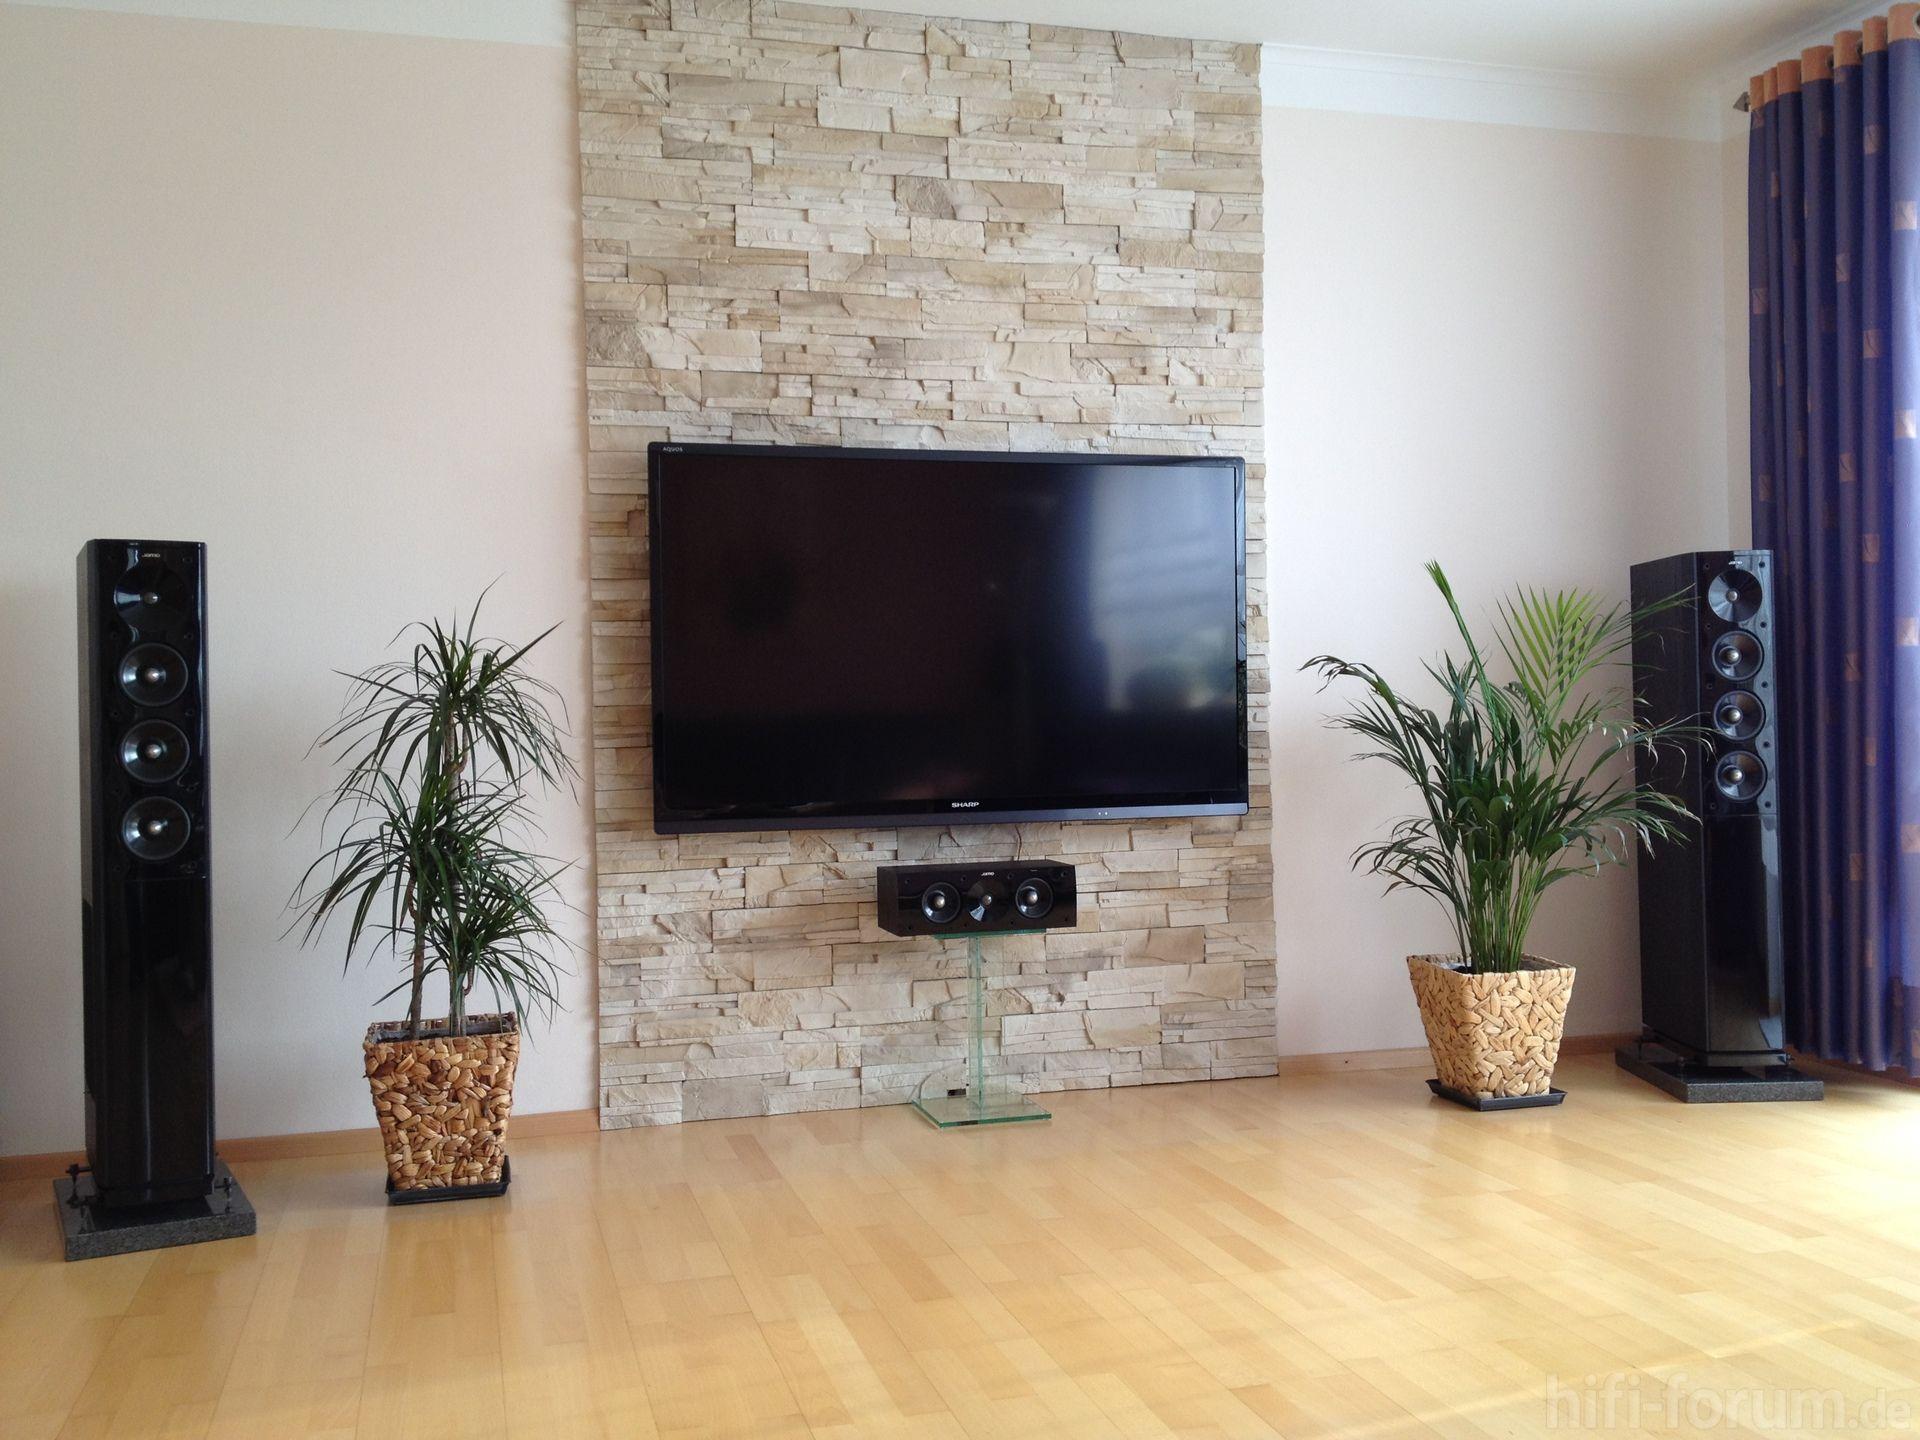 wohnzimmer ideen prenova m m pinterest wohnzimmer ideen wohnzimmer und wohnen. Black Bedroom Furniture Sets. Home Design Ideas